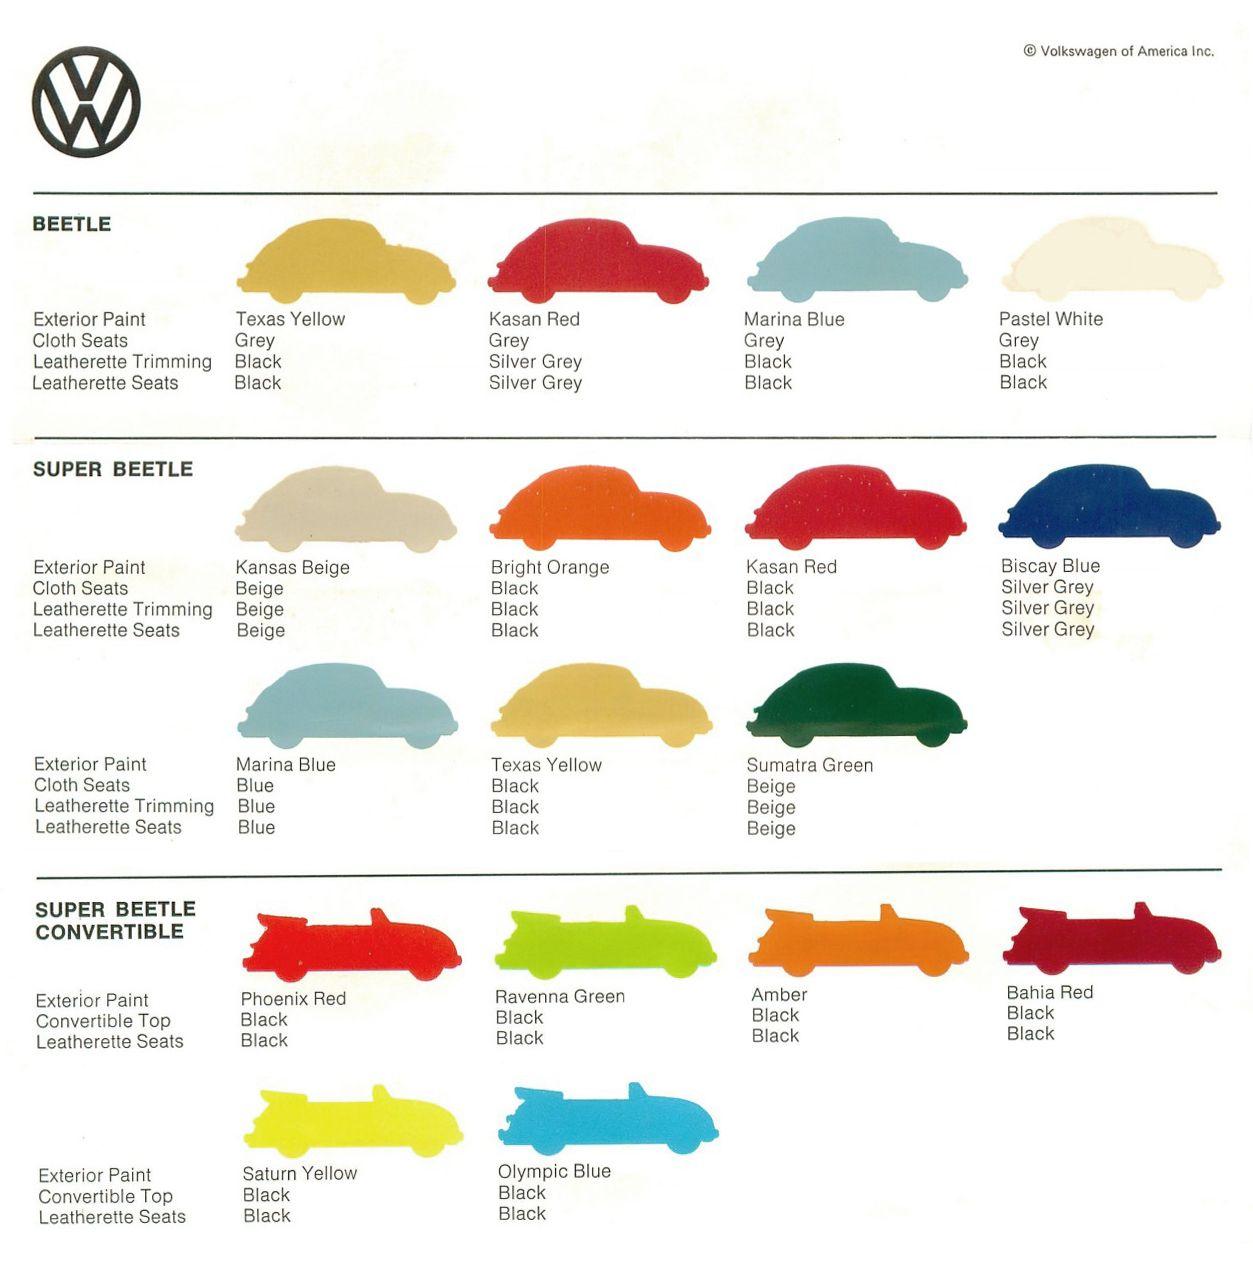 VW Beetle, Color Sheet, 1973  Volkswagen of America  Via